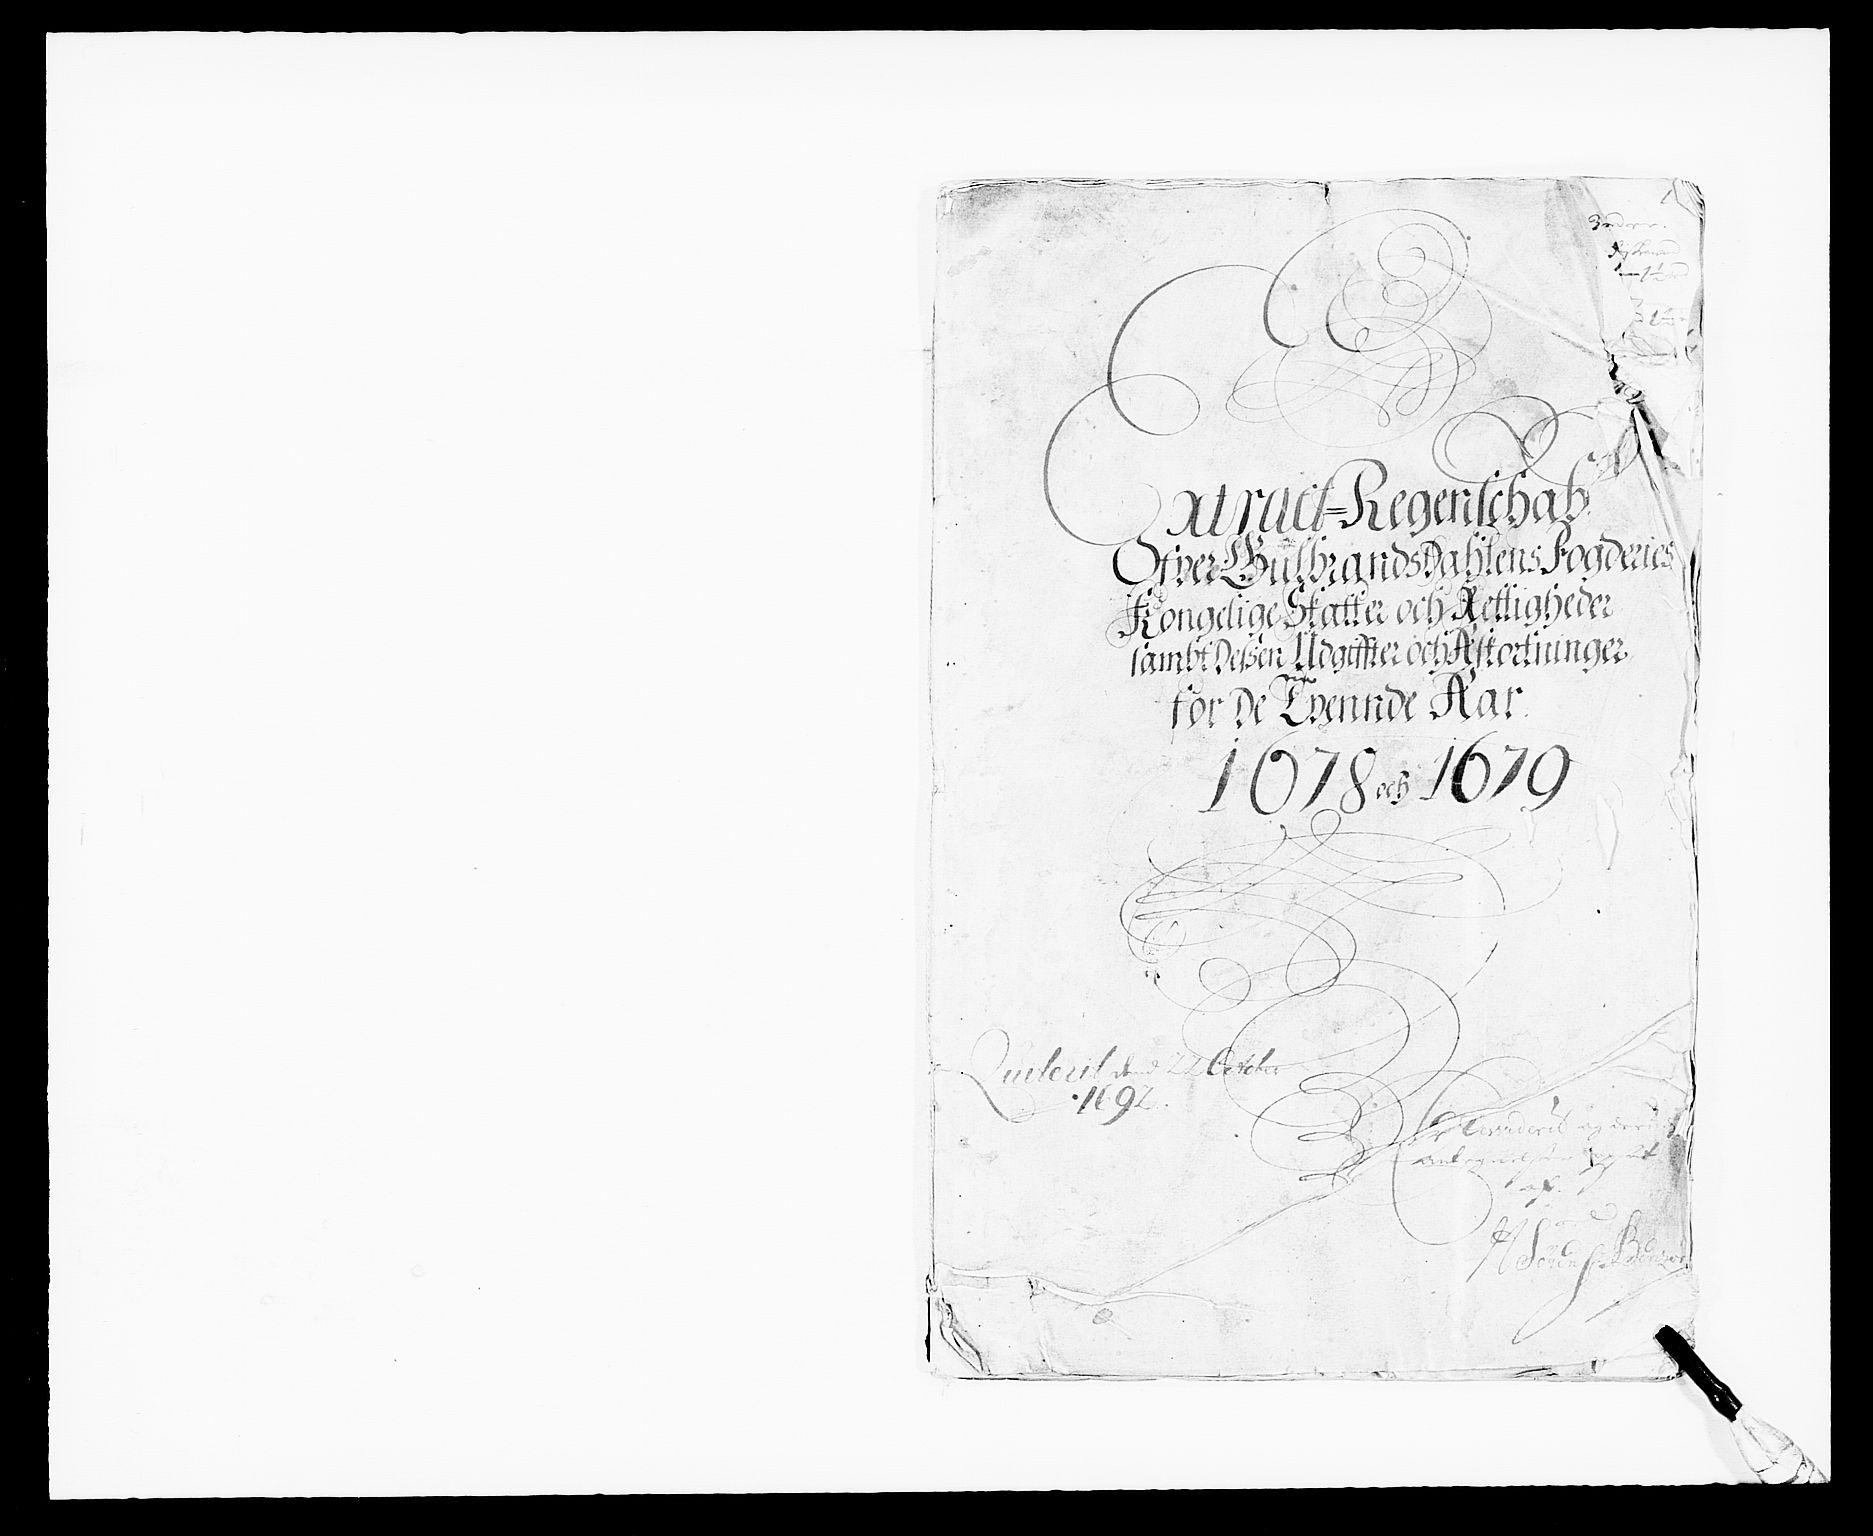 RA, Rentekammeret inntil 1814, Reviderte regnskaper, Fogderegnskap, R17/L1152: Fogderegnskap Gudbrandsdal, 1678-1679, s. 2